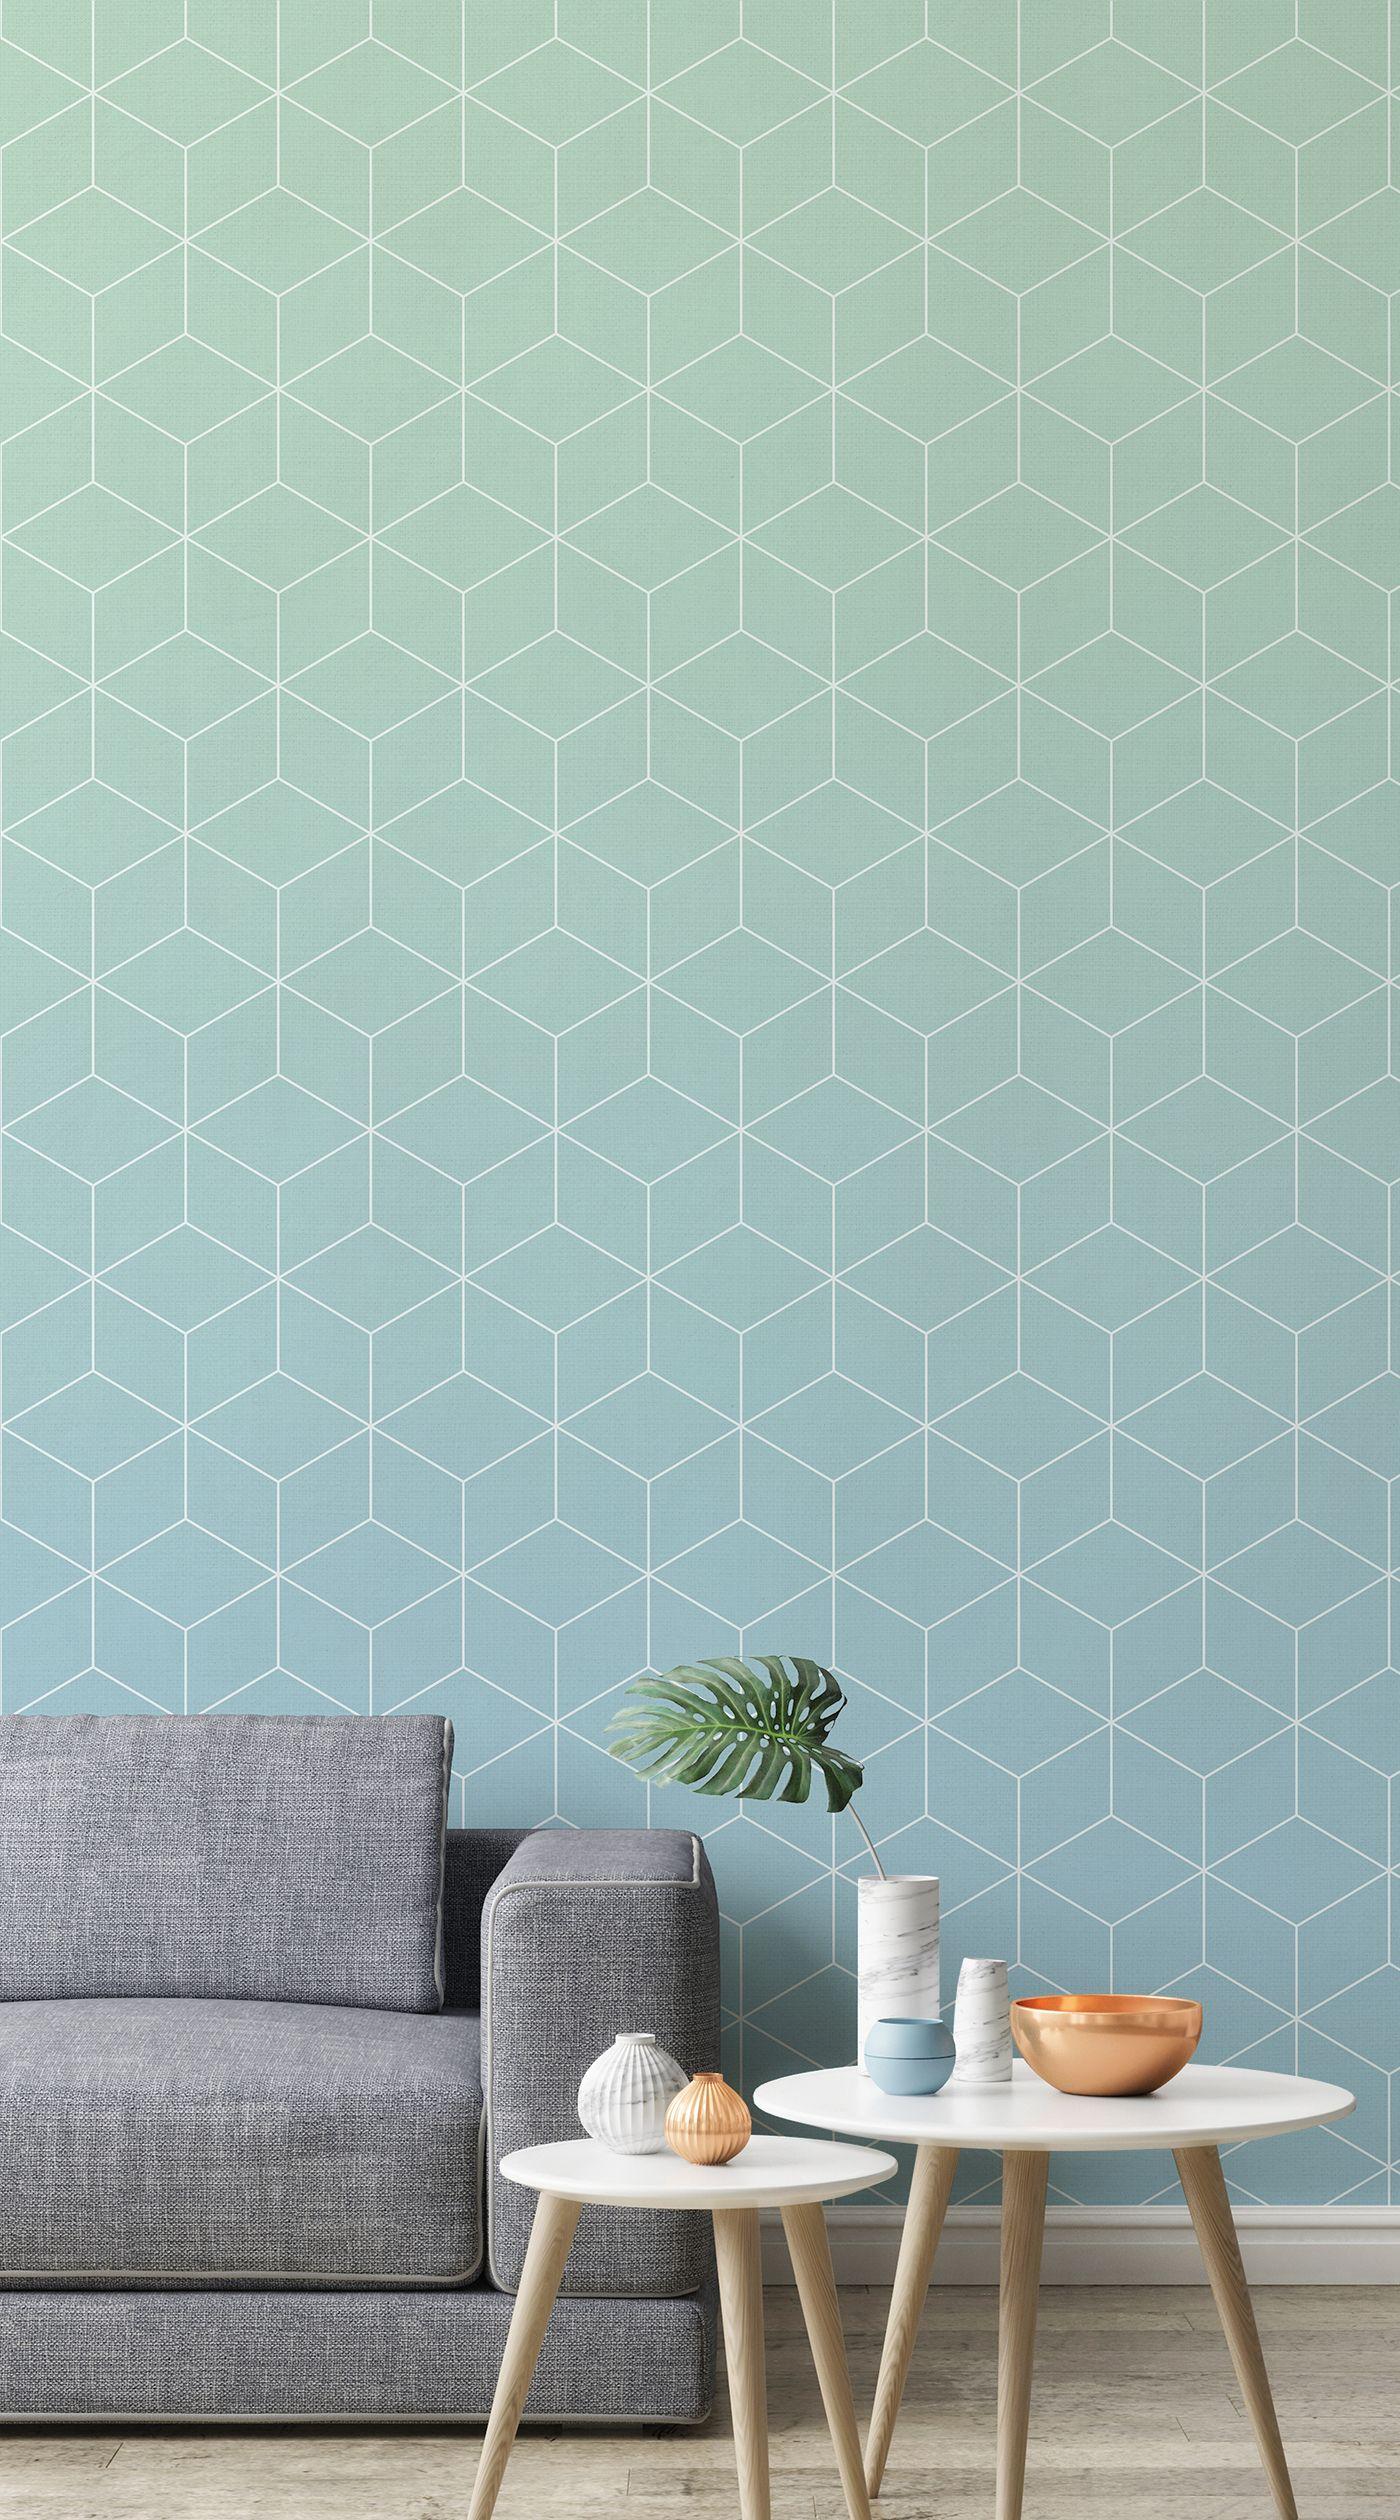 Aquamarine Patterned Ombre Wallpaper Mural Murals Wallp